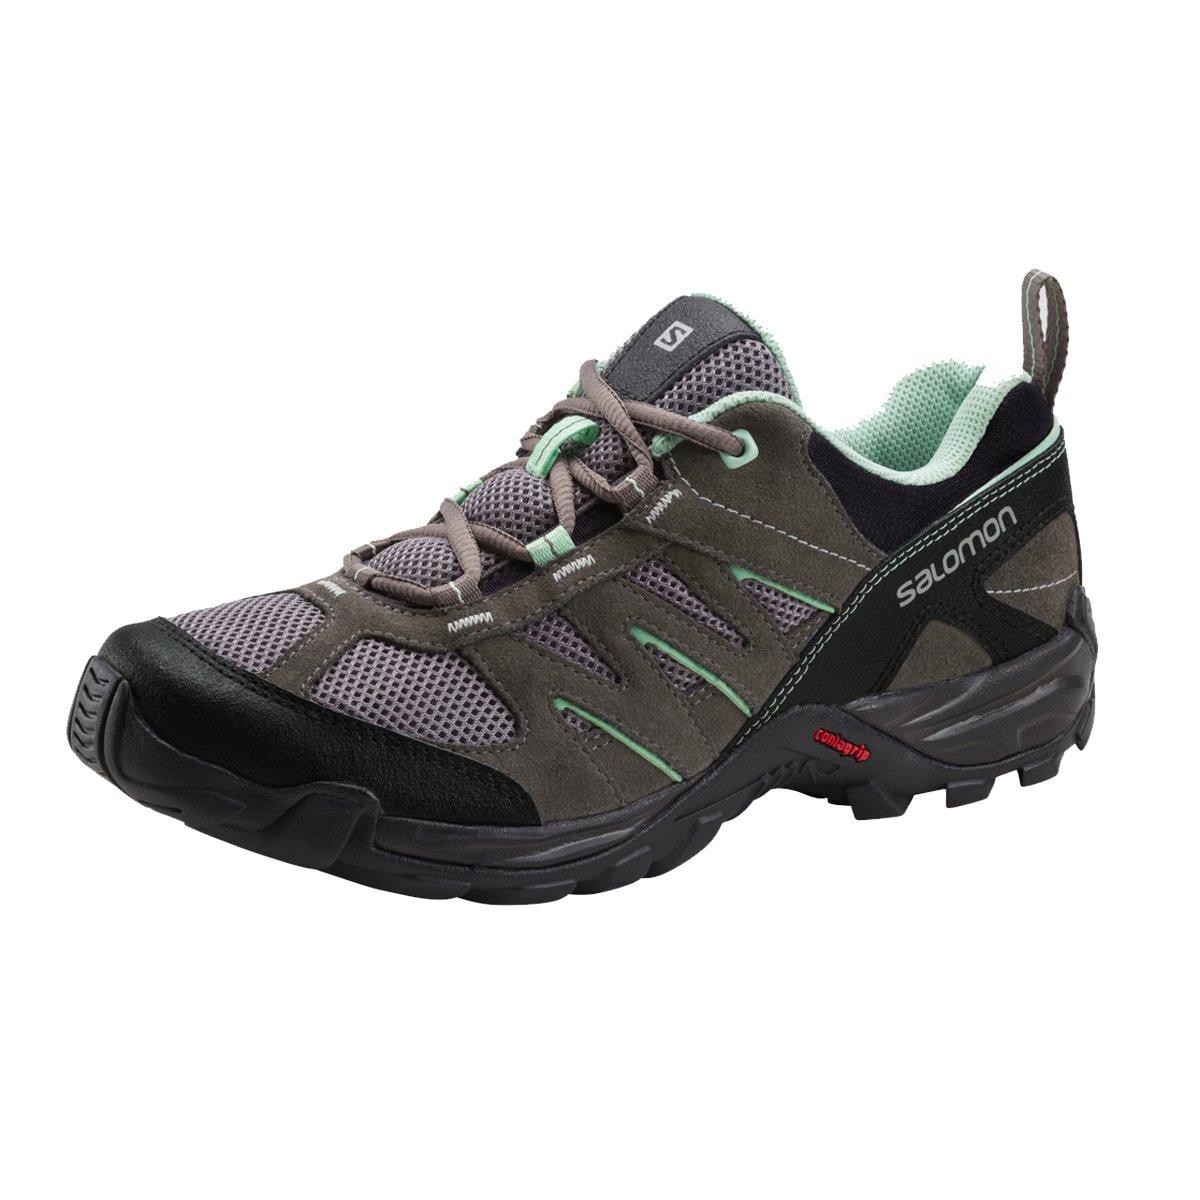 Salomon ROTwood Damen Trekking Trailschuh Outdoor grau/blau UVP 89,95 36 2/3